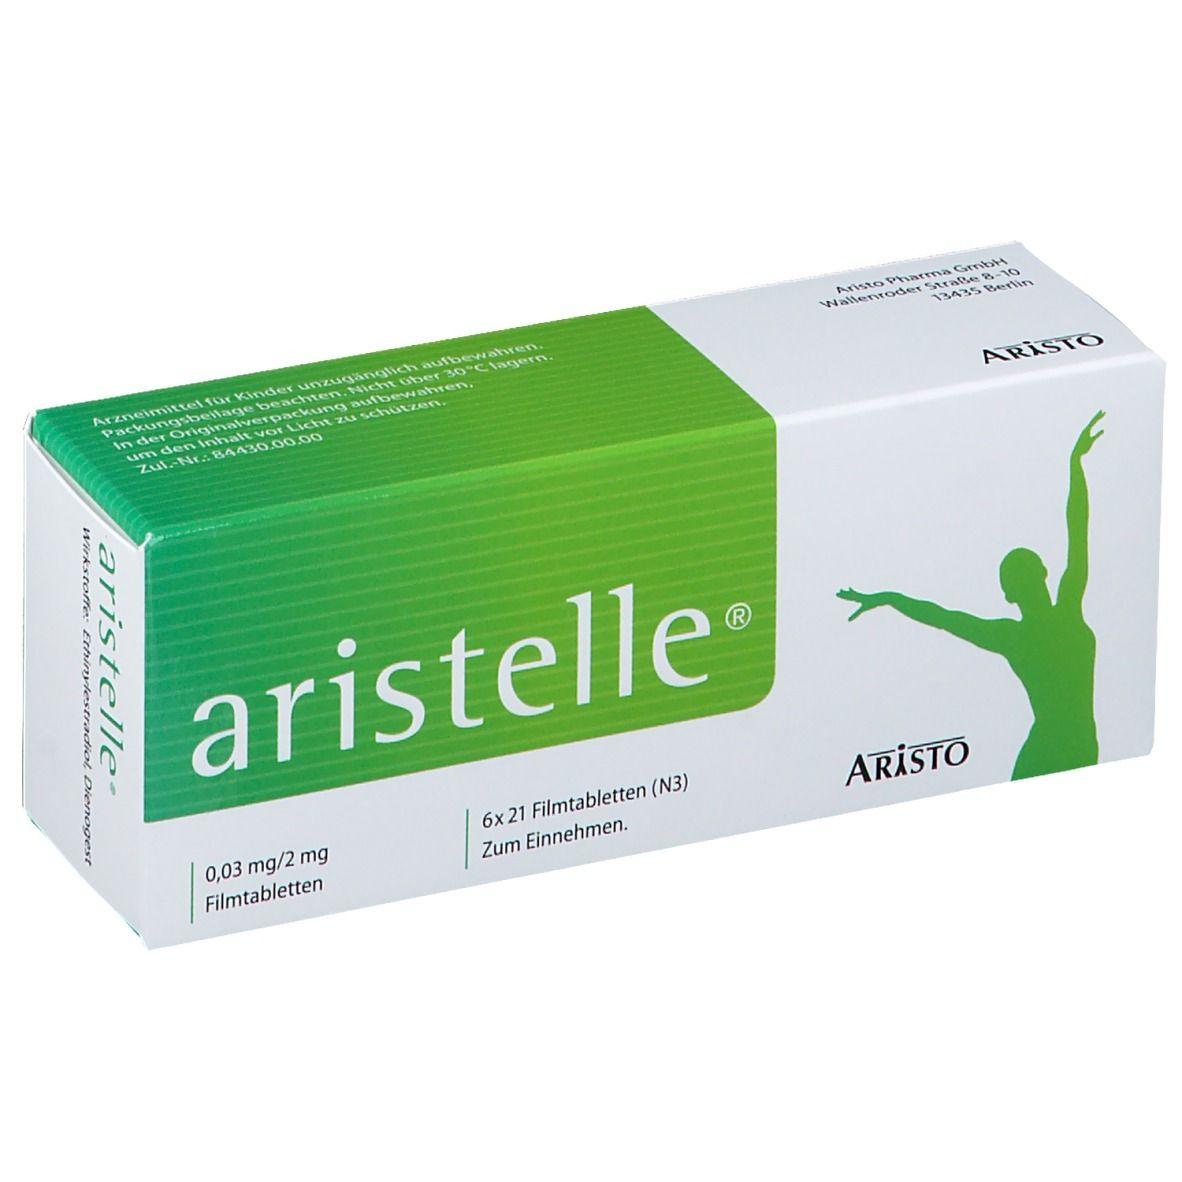 aristelle® 0,03 mg/2 mg 6X21 St - shop-apotheke.com